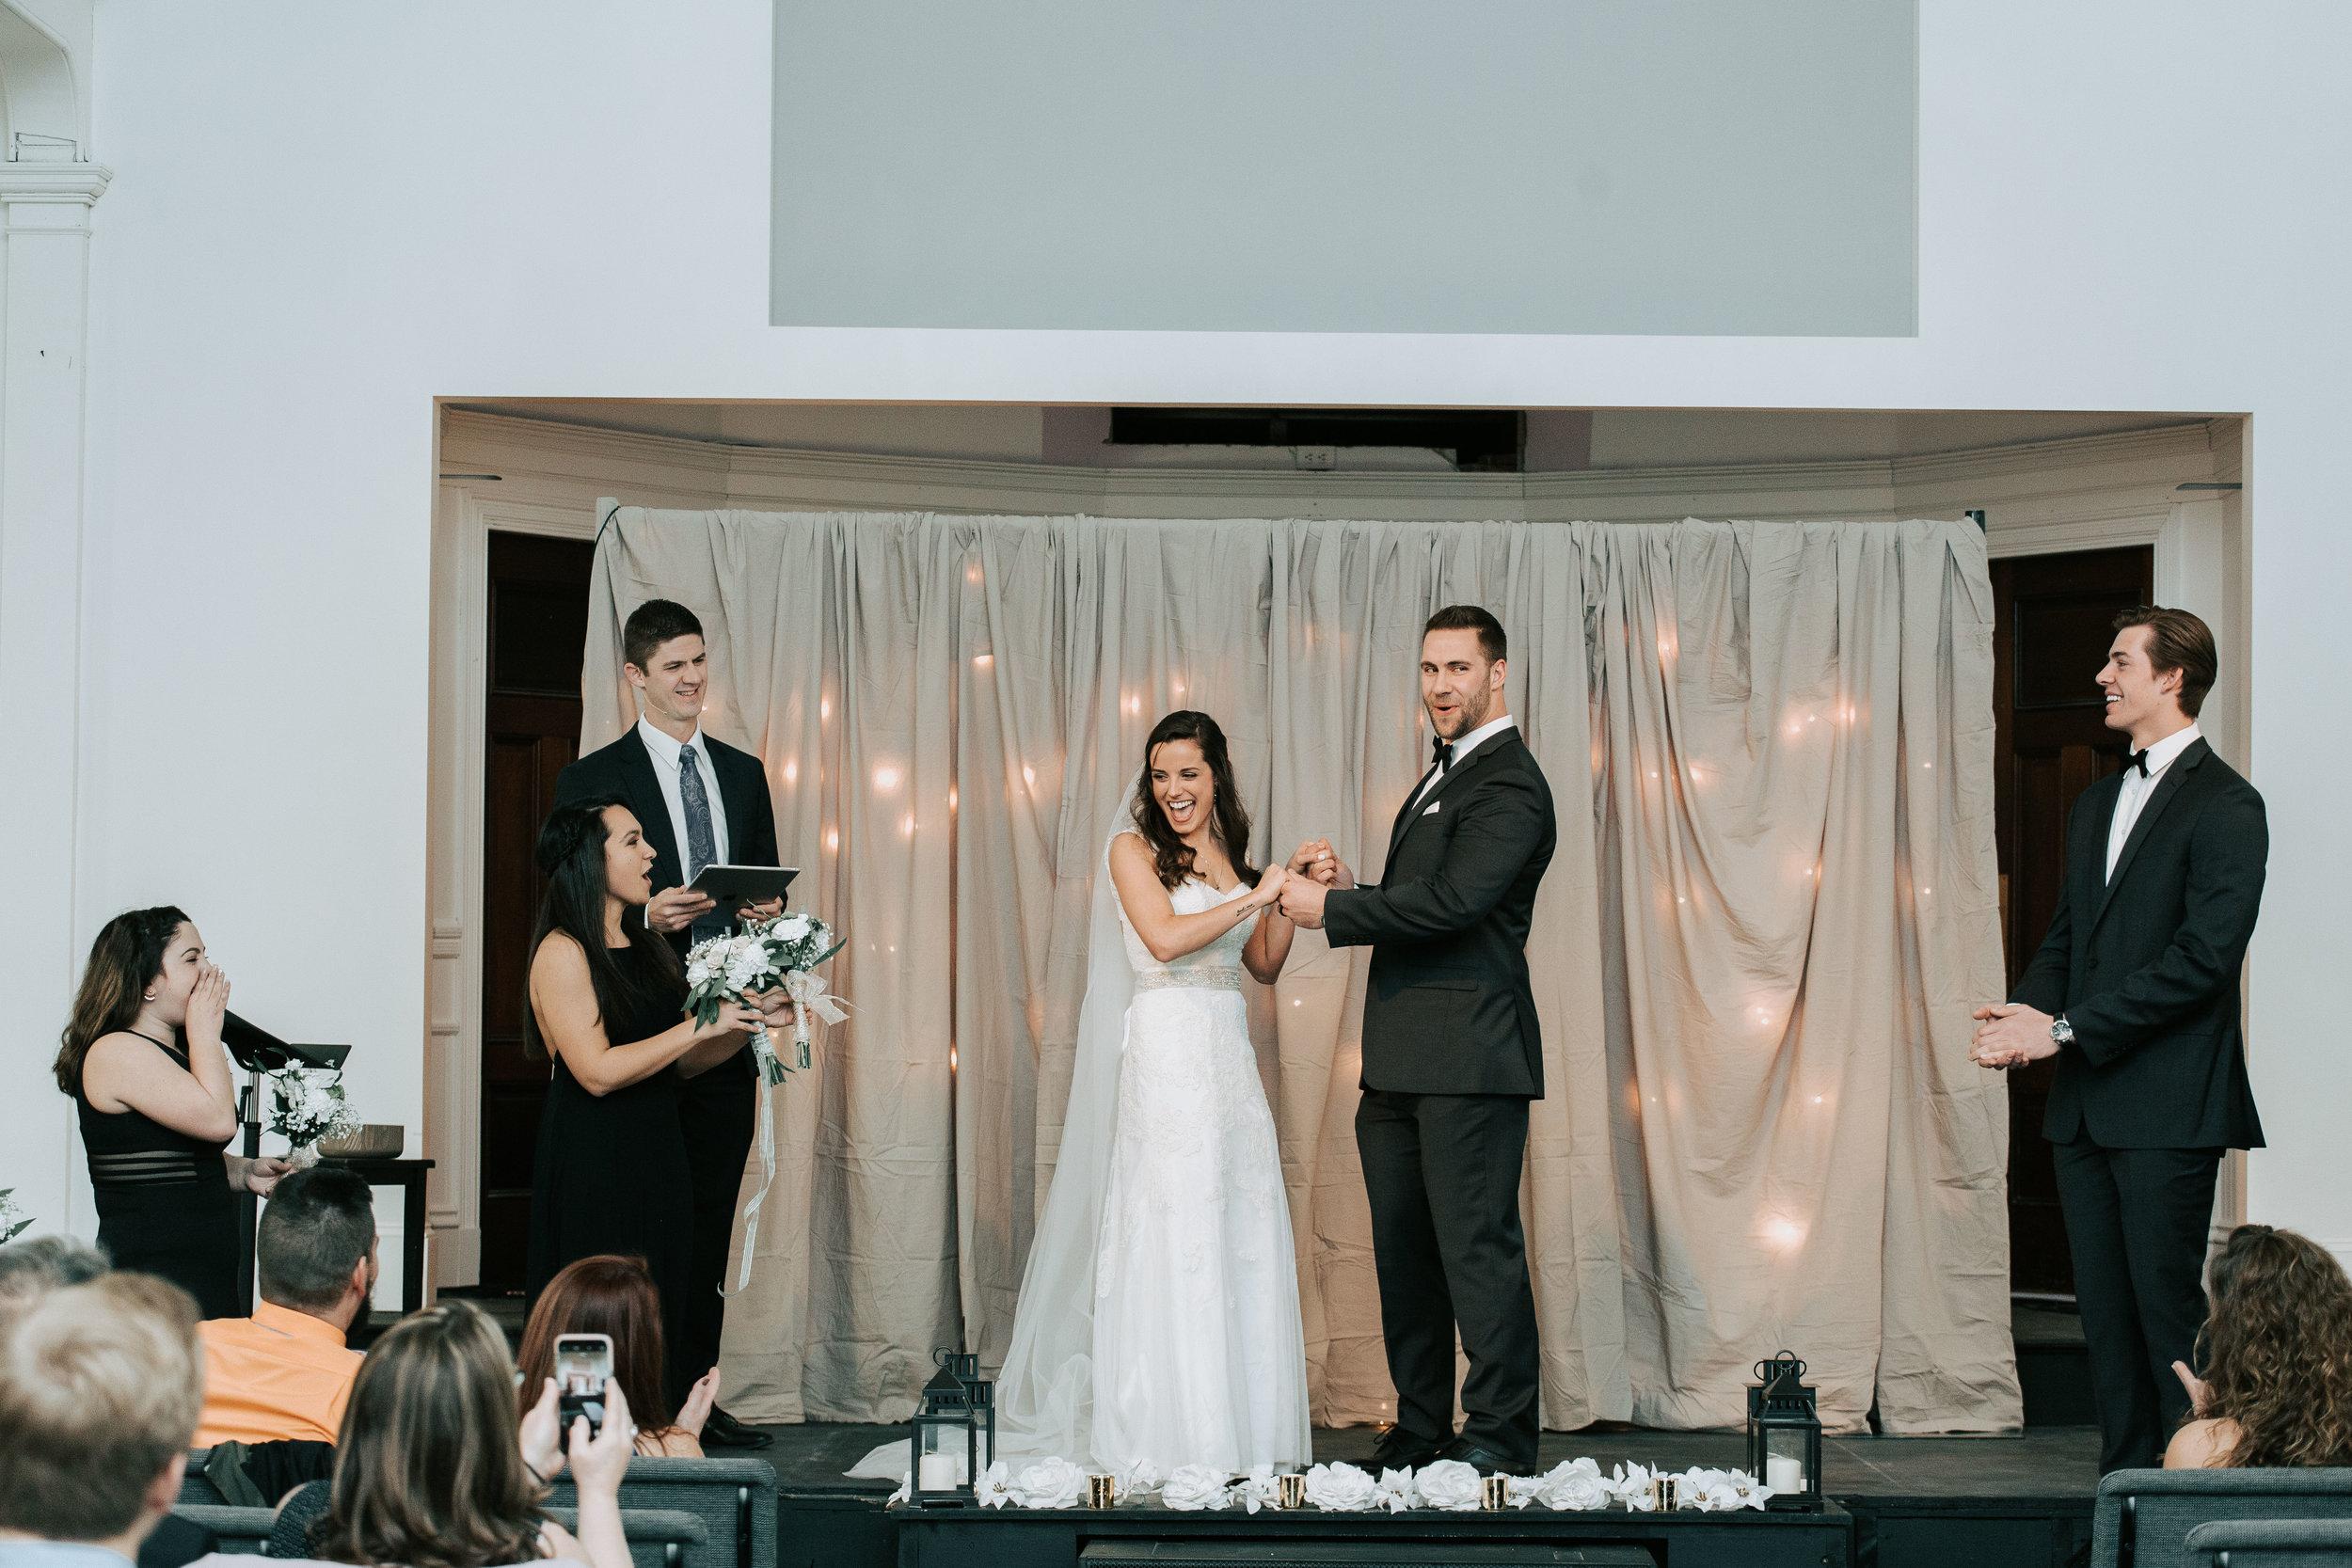 nicole-daacke-photography-boston-massachusetts-seaside-intimate-winter-wedding-photographer-14.jpg